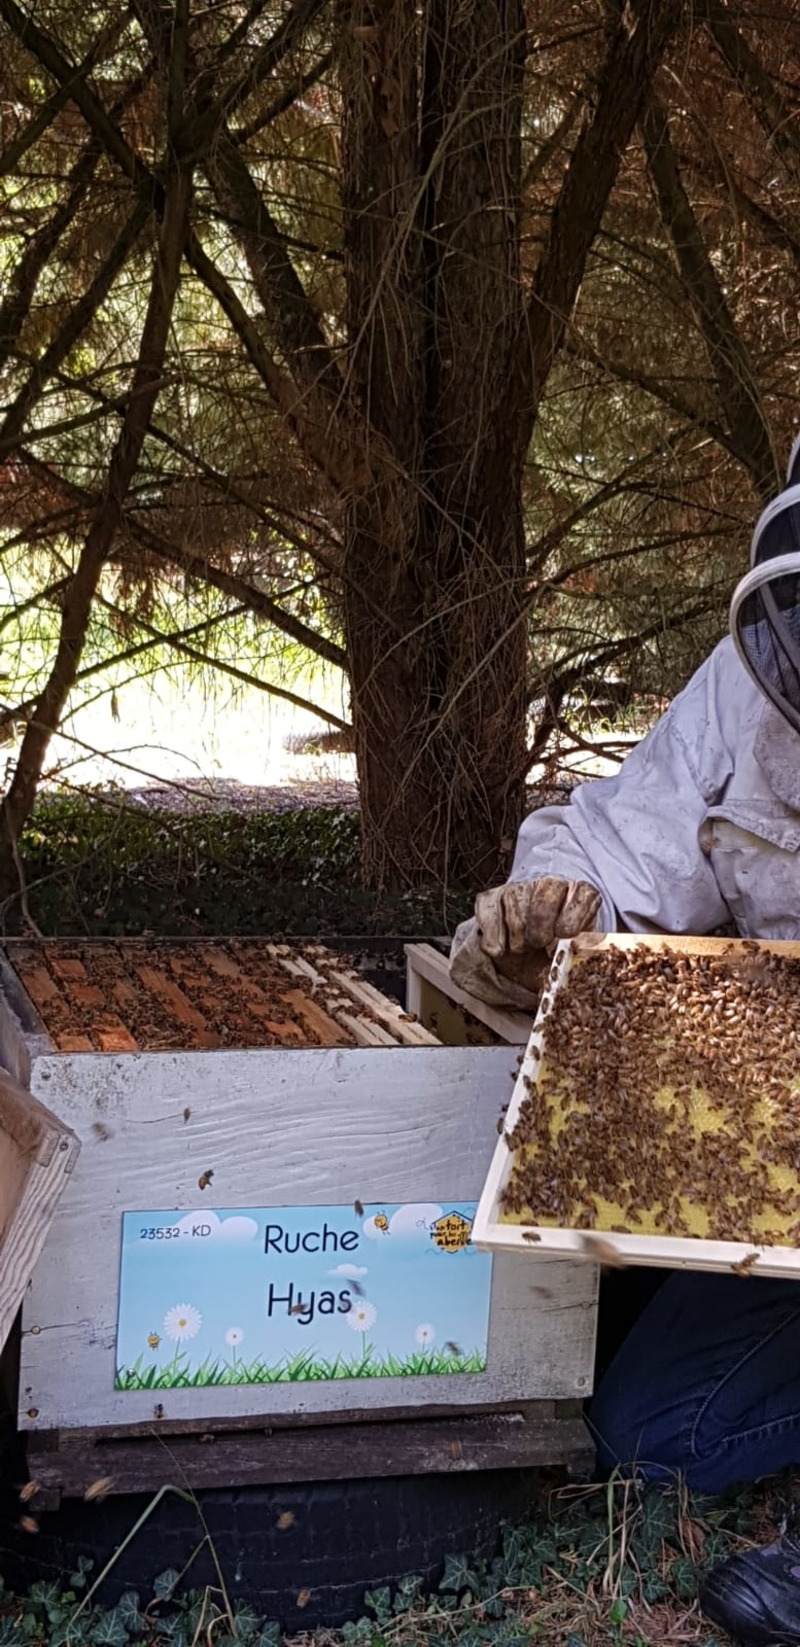 La ruche Hyas